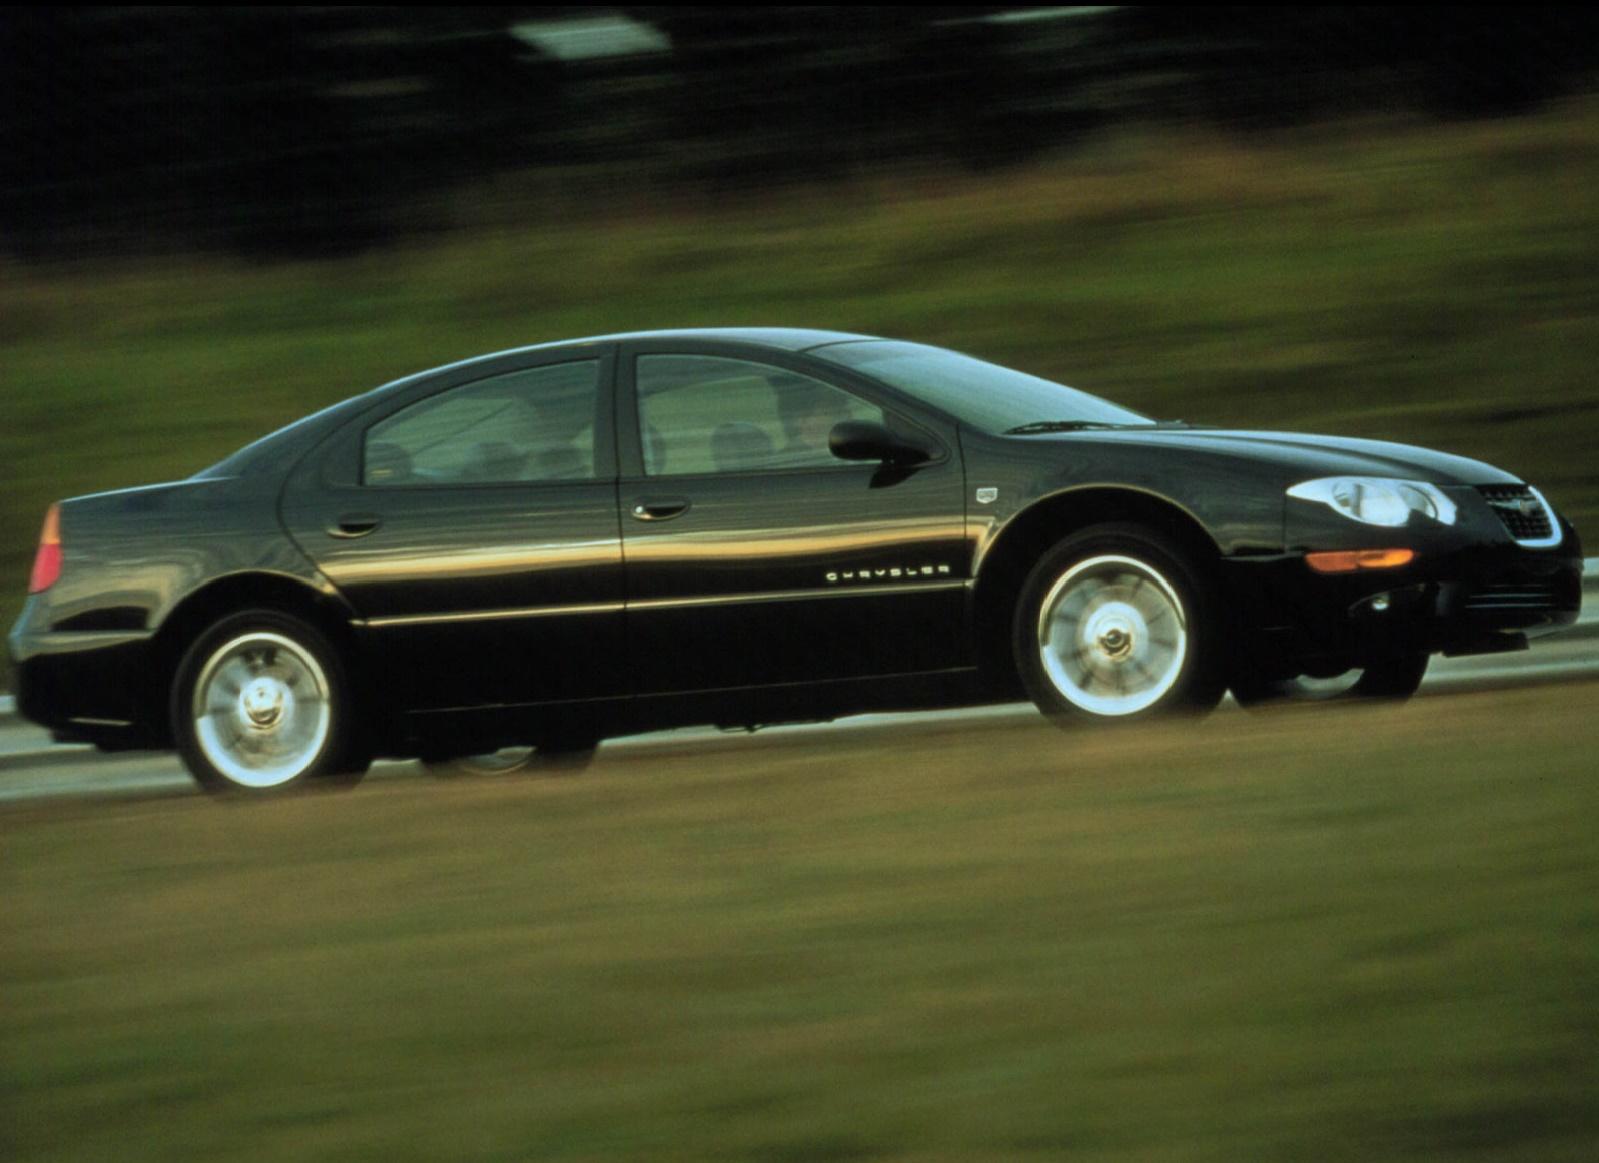 Photo Courtesy Chrysler.